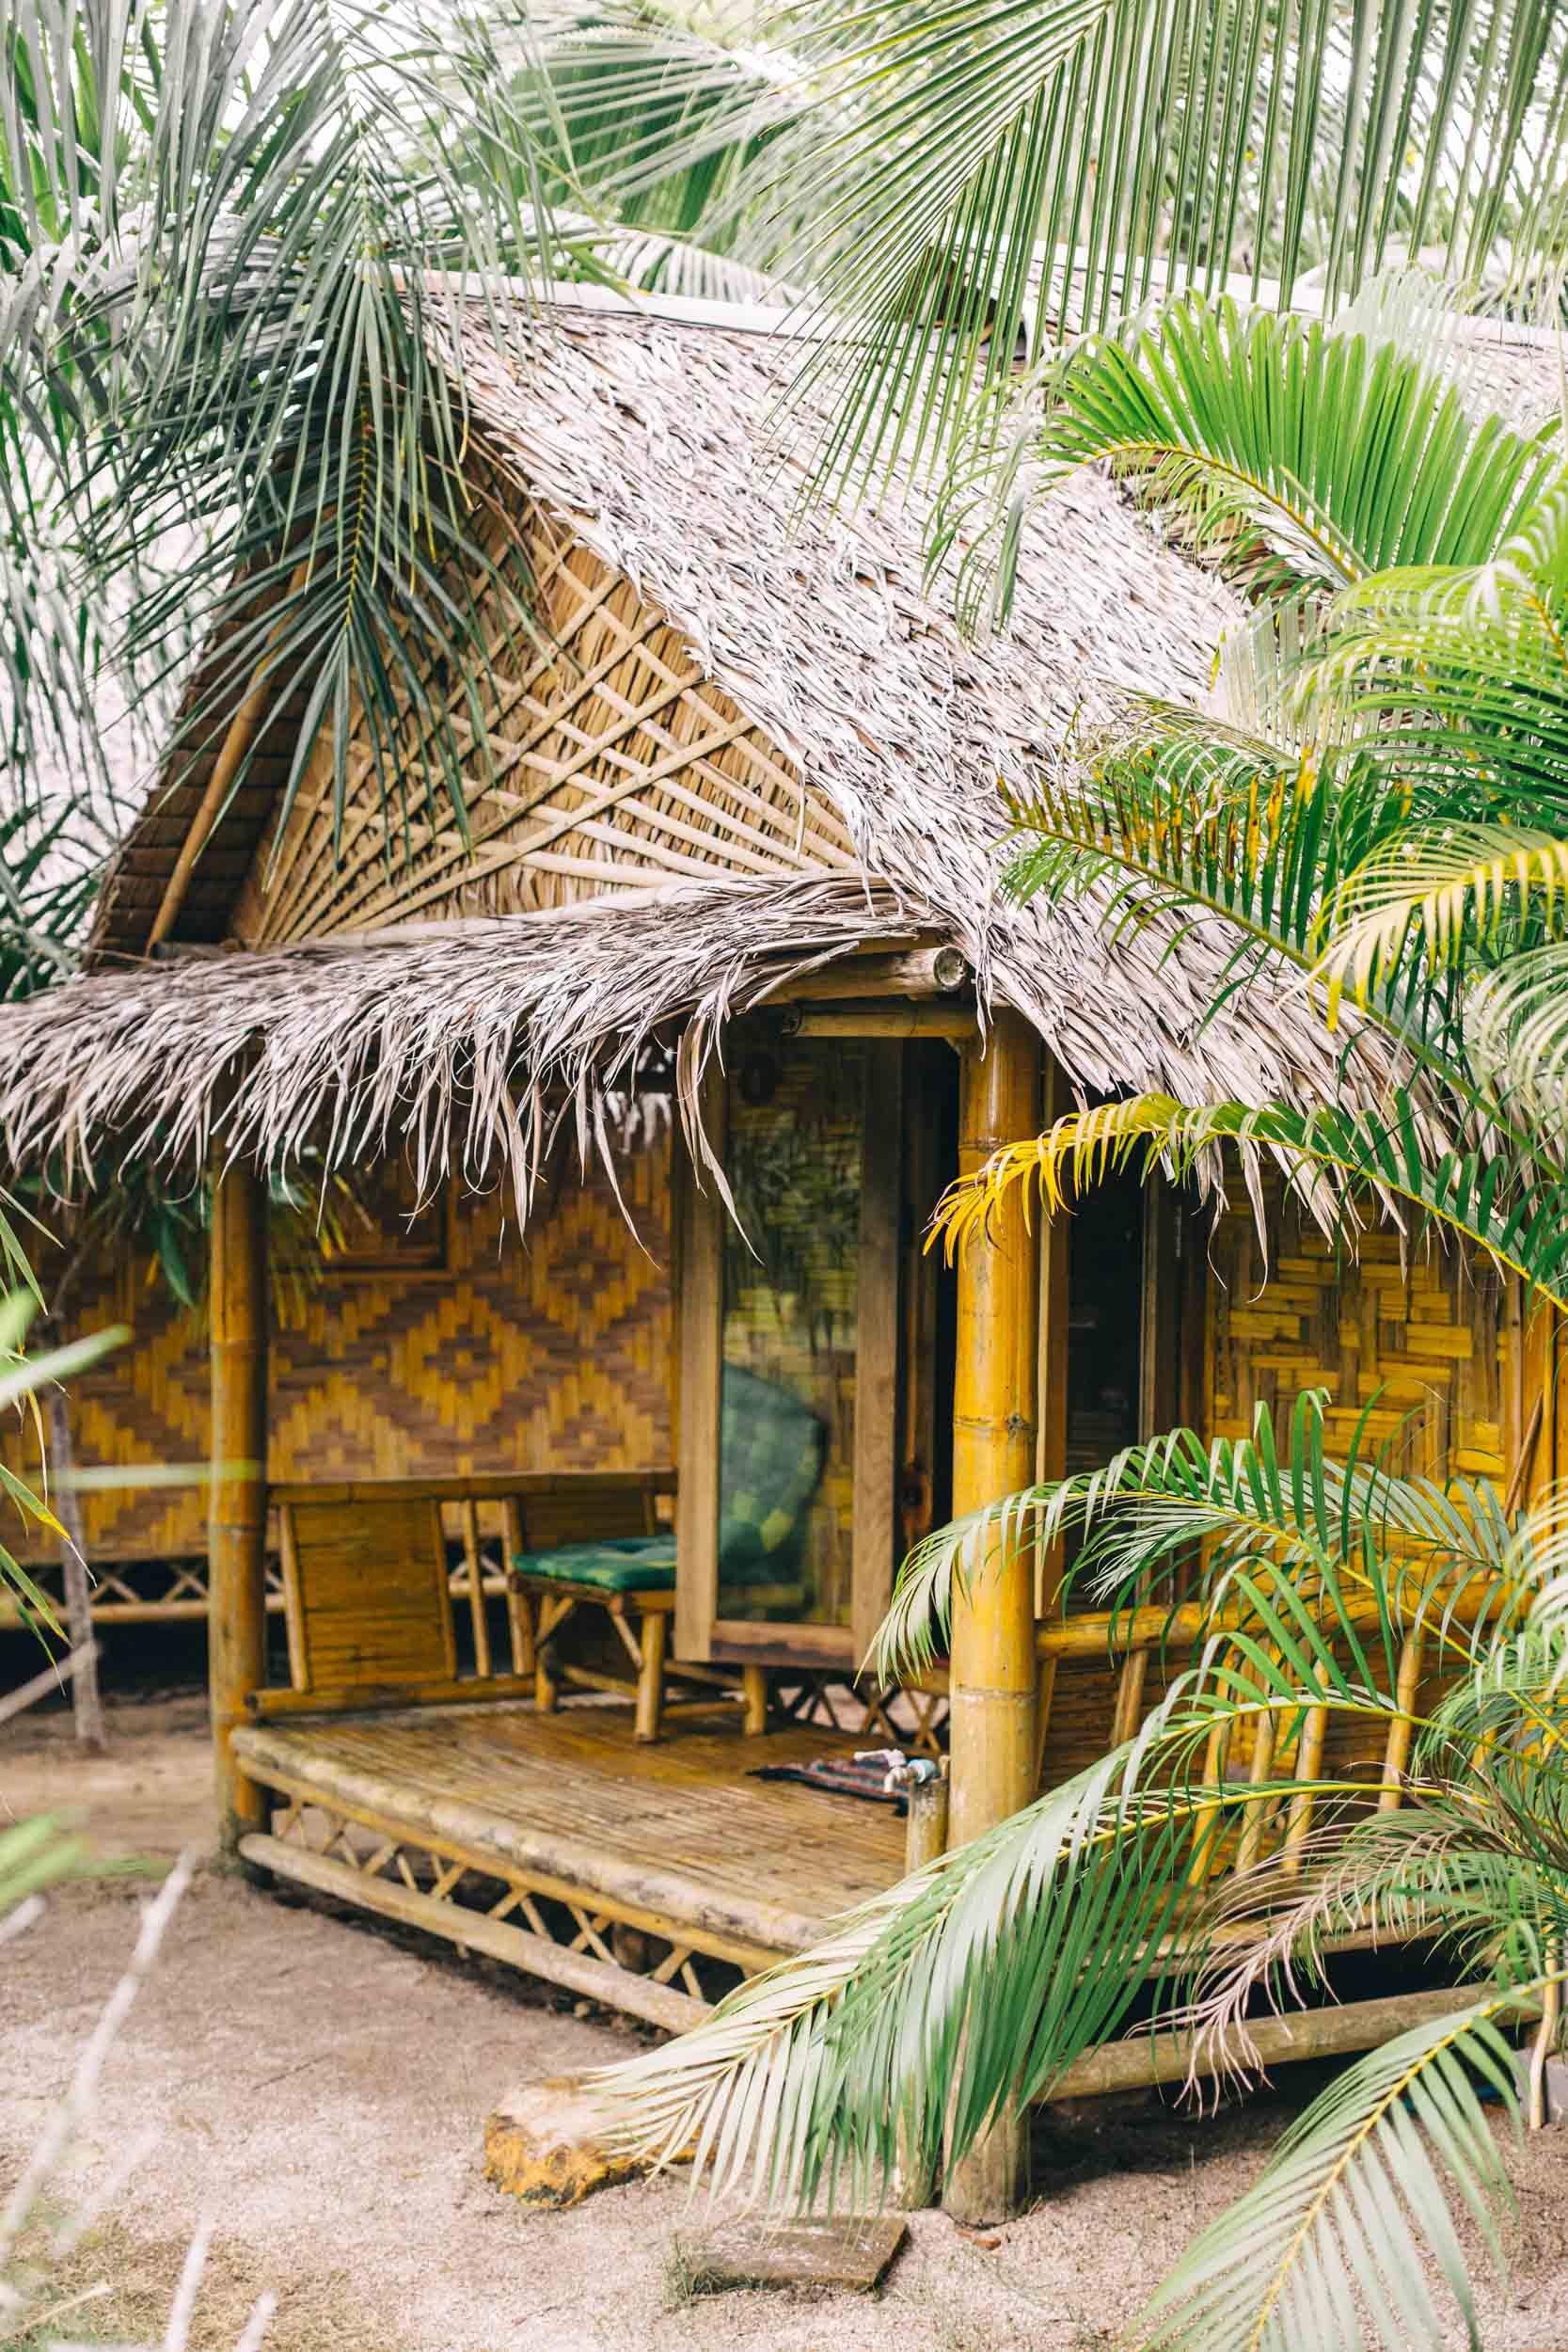 thailand_budget_travel_093.jpg